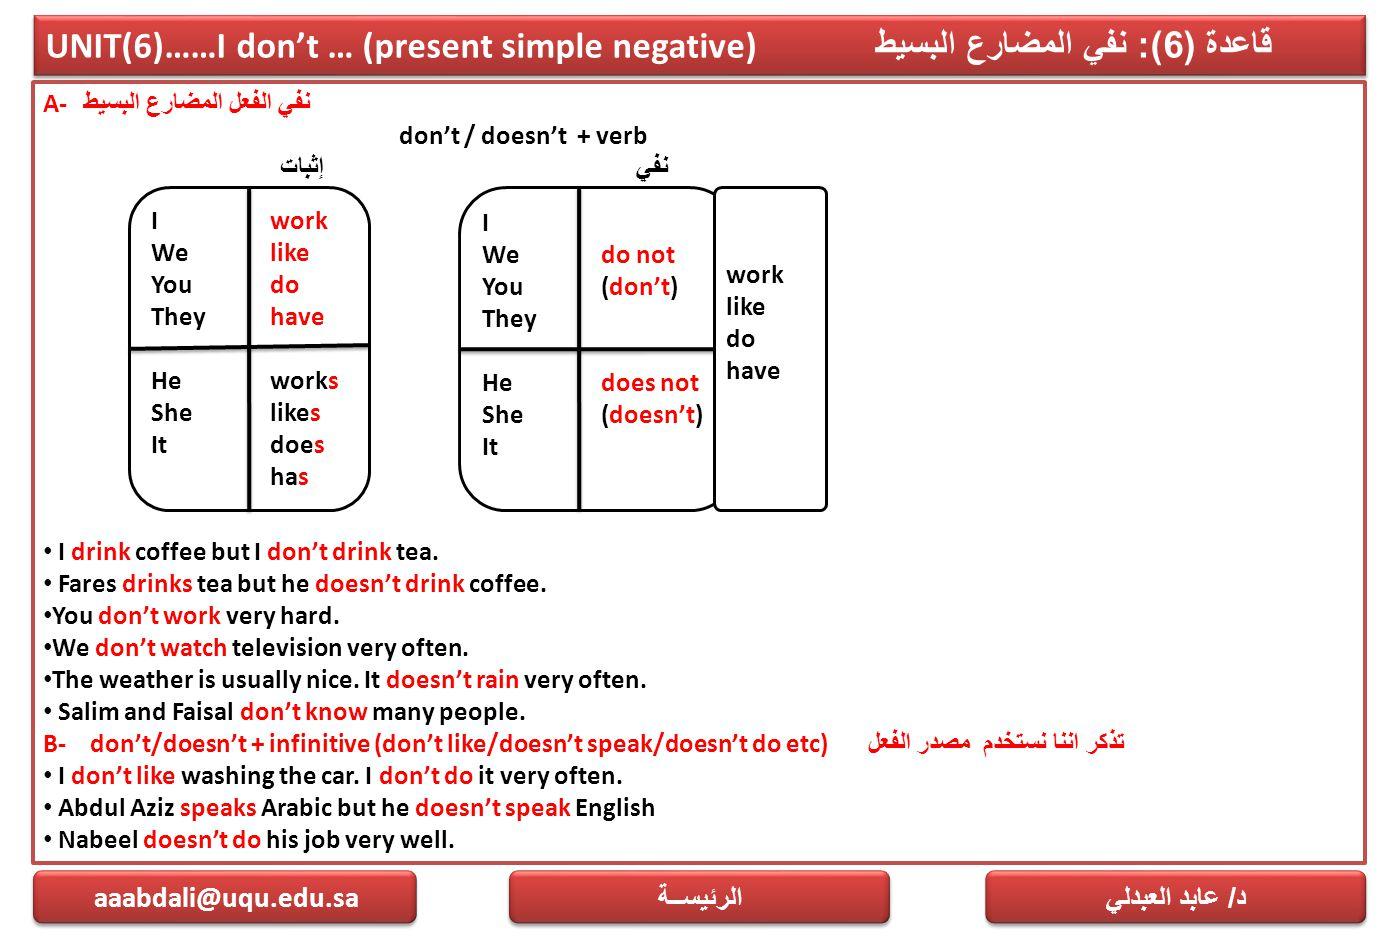 UNIT(6)……I don't … (present simple negative)